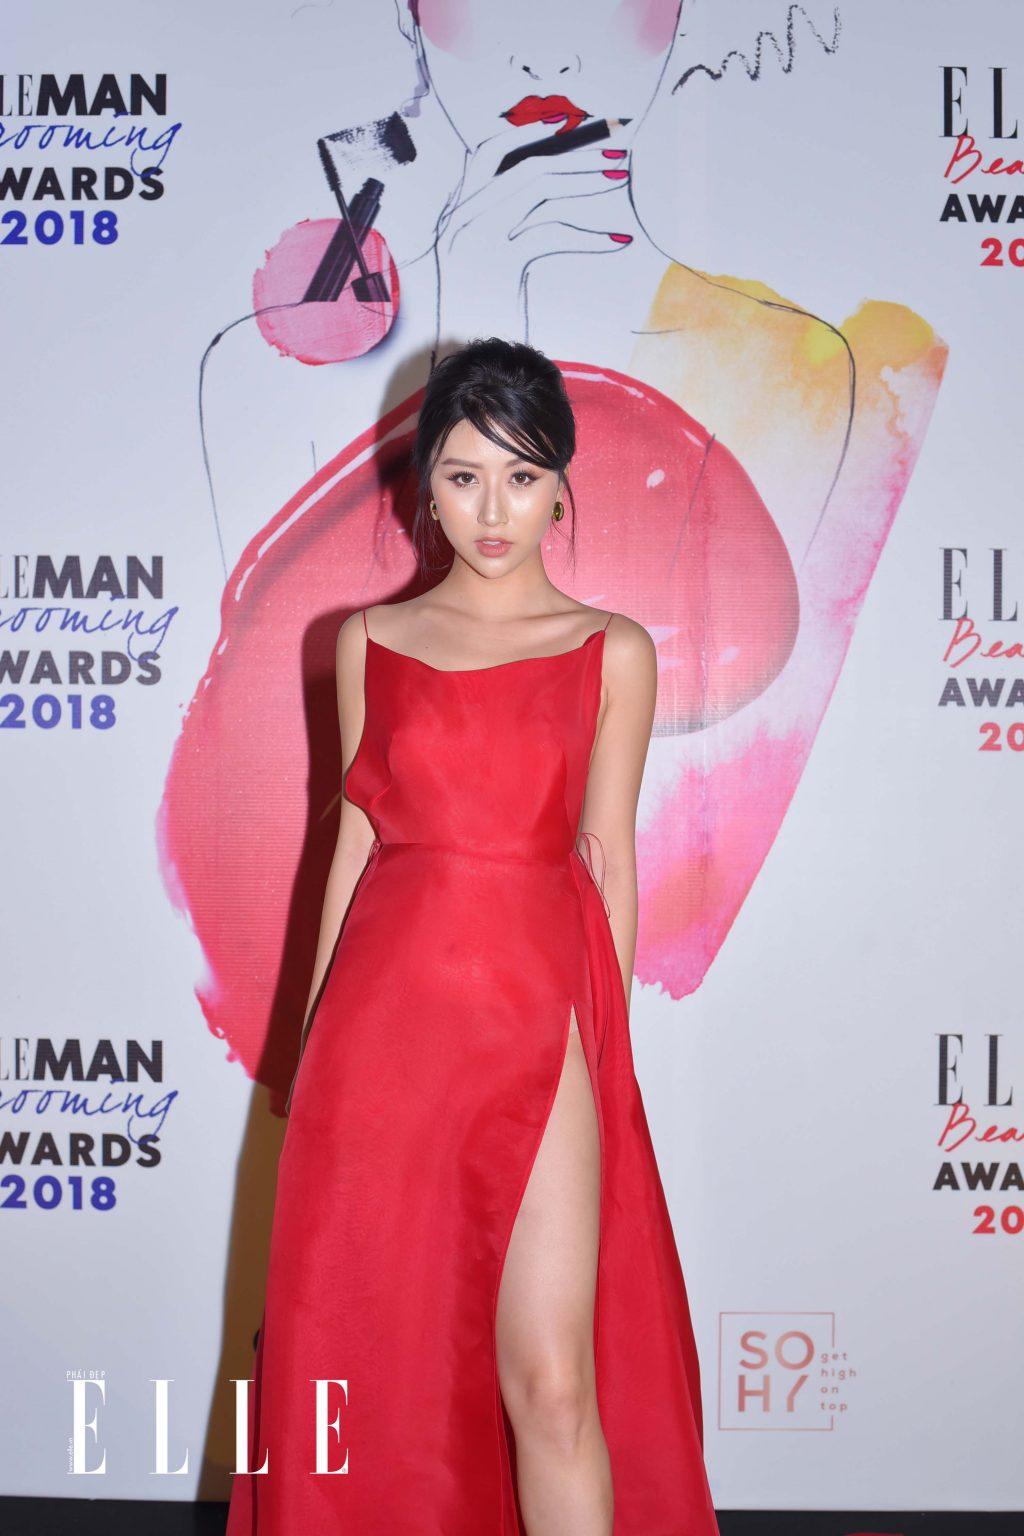 ELLE Beauty Awards 2018 trang điểm ấn tượng 2